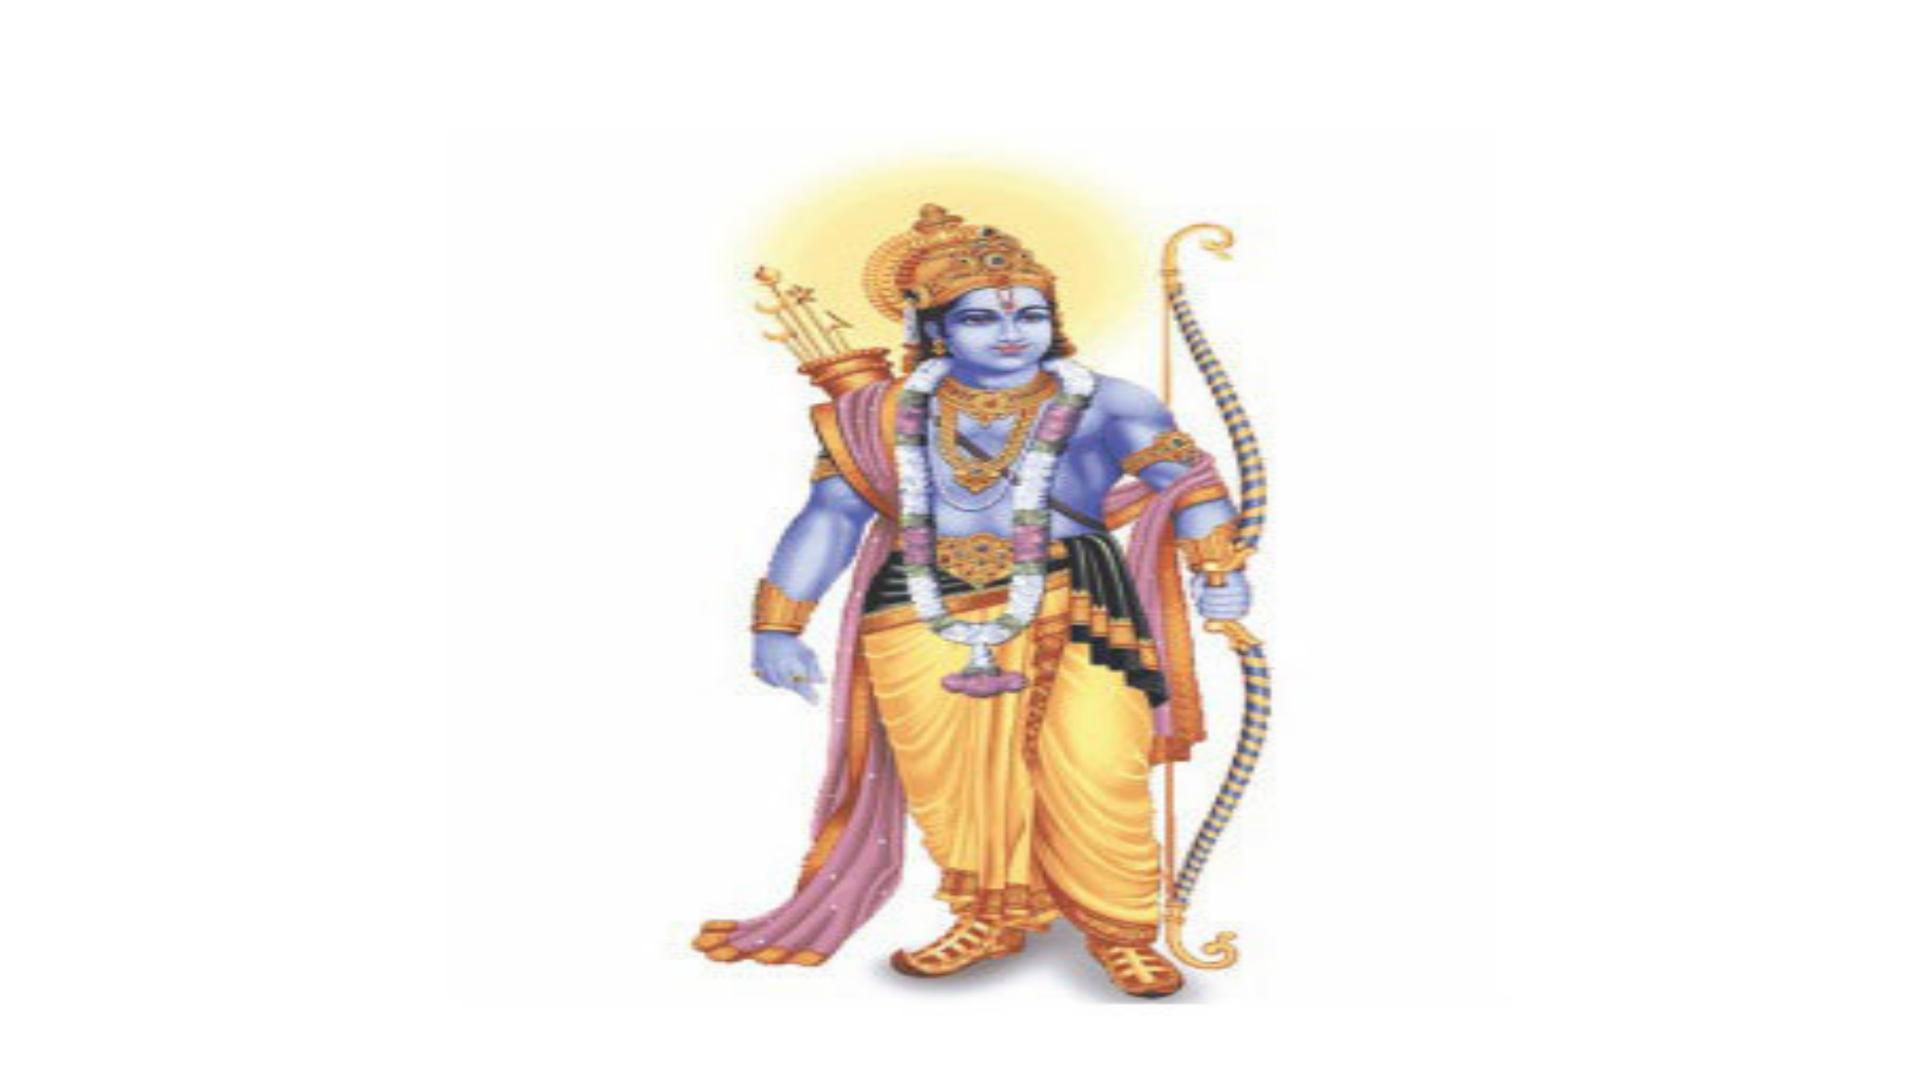 Ram janmabhoomi ayodhya mandir - राम जन्मभूमि अयोध्या मंदिर